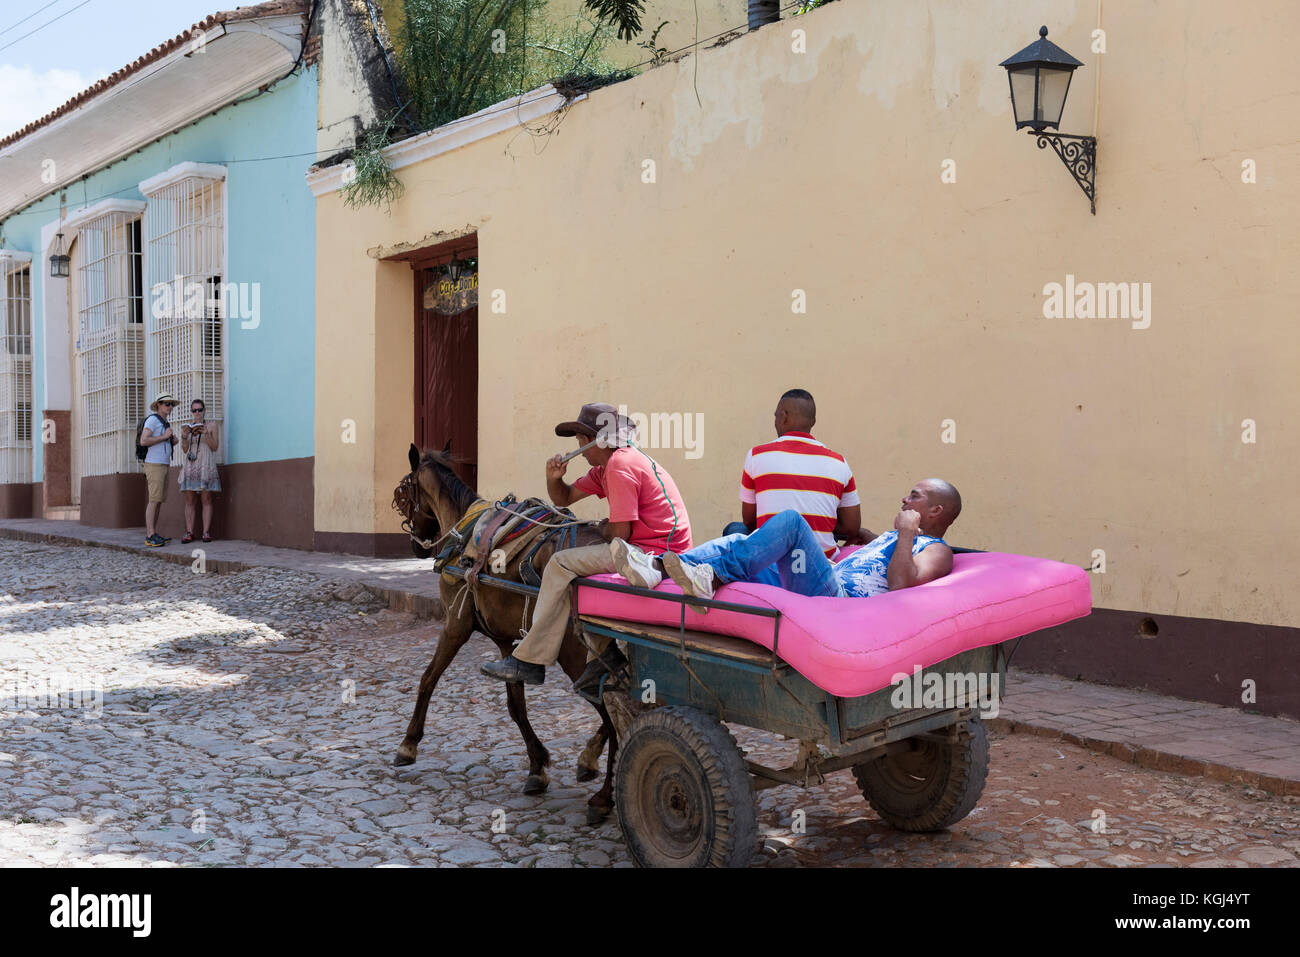 Daily life Trinidad Cuba - Stock Image